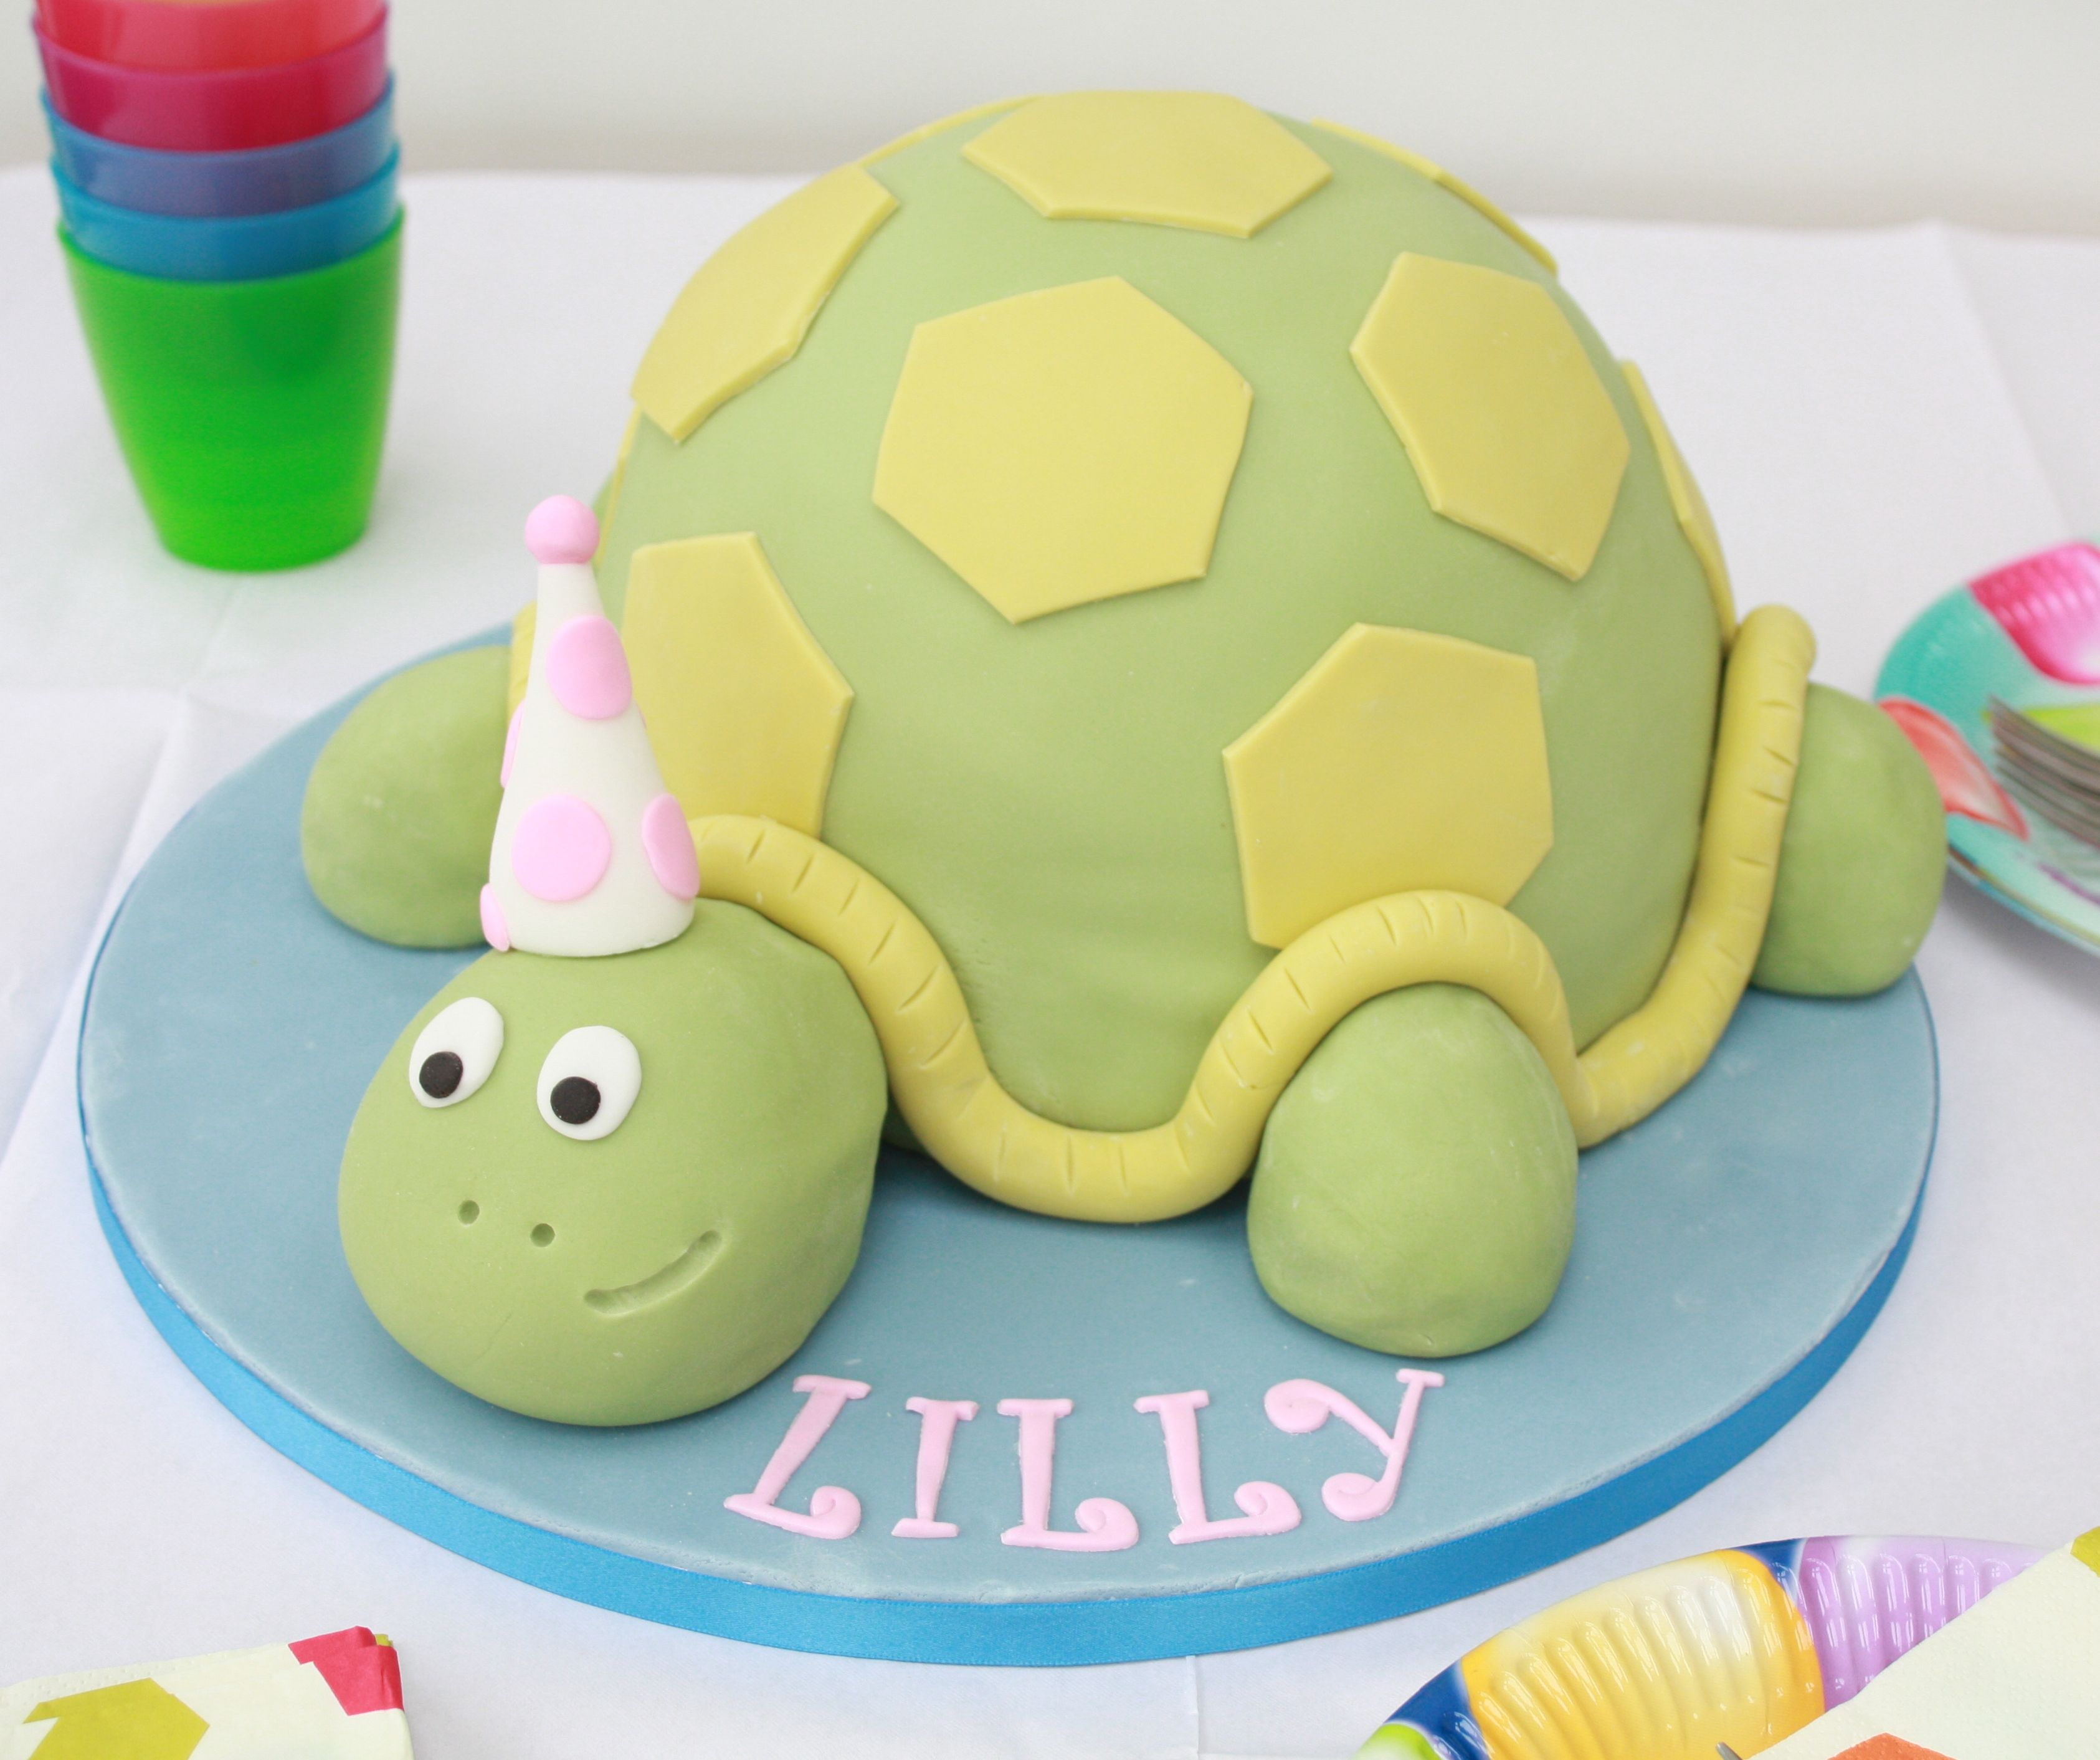 Pastel decorado con fondant para una fiesta fondant turtle cake